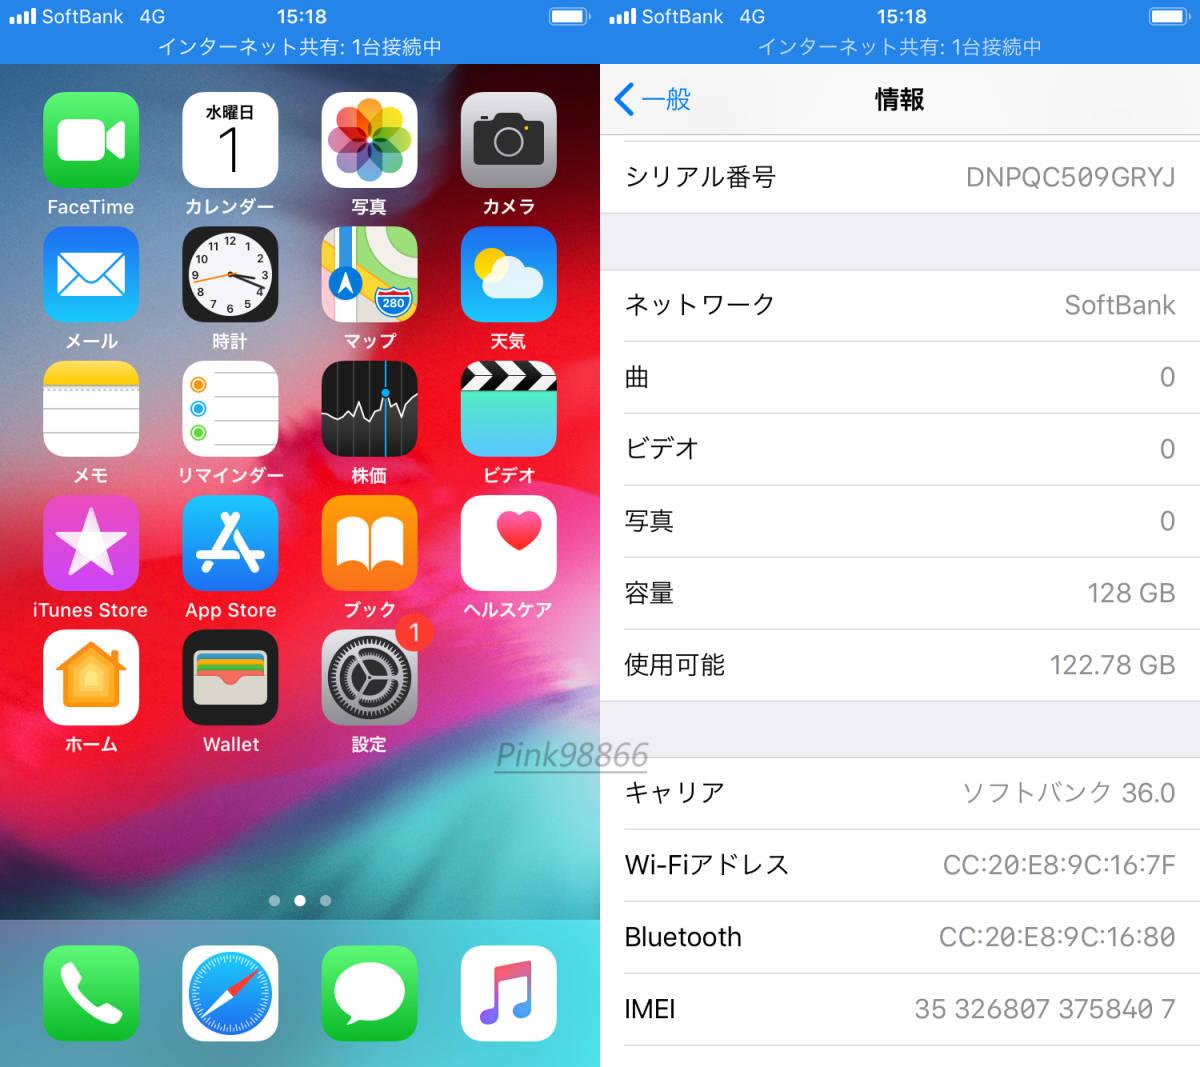 ☆人気☆SB iPhone6S 128GB ゴールド 本体128G/格安MVNO SIM使用可能/格安SIM月額500円から/土日祝日も発送/大容量_画像7